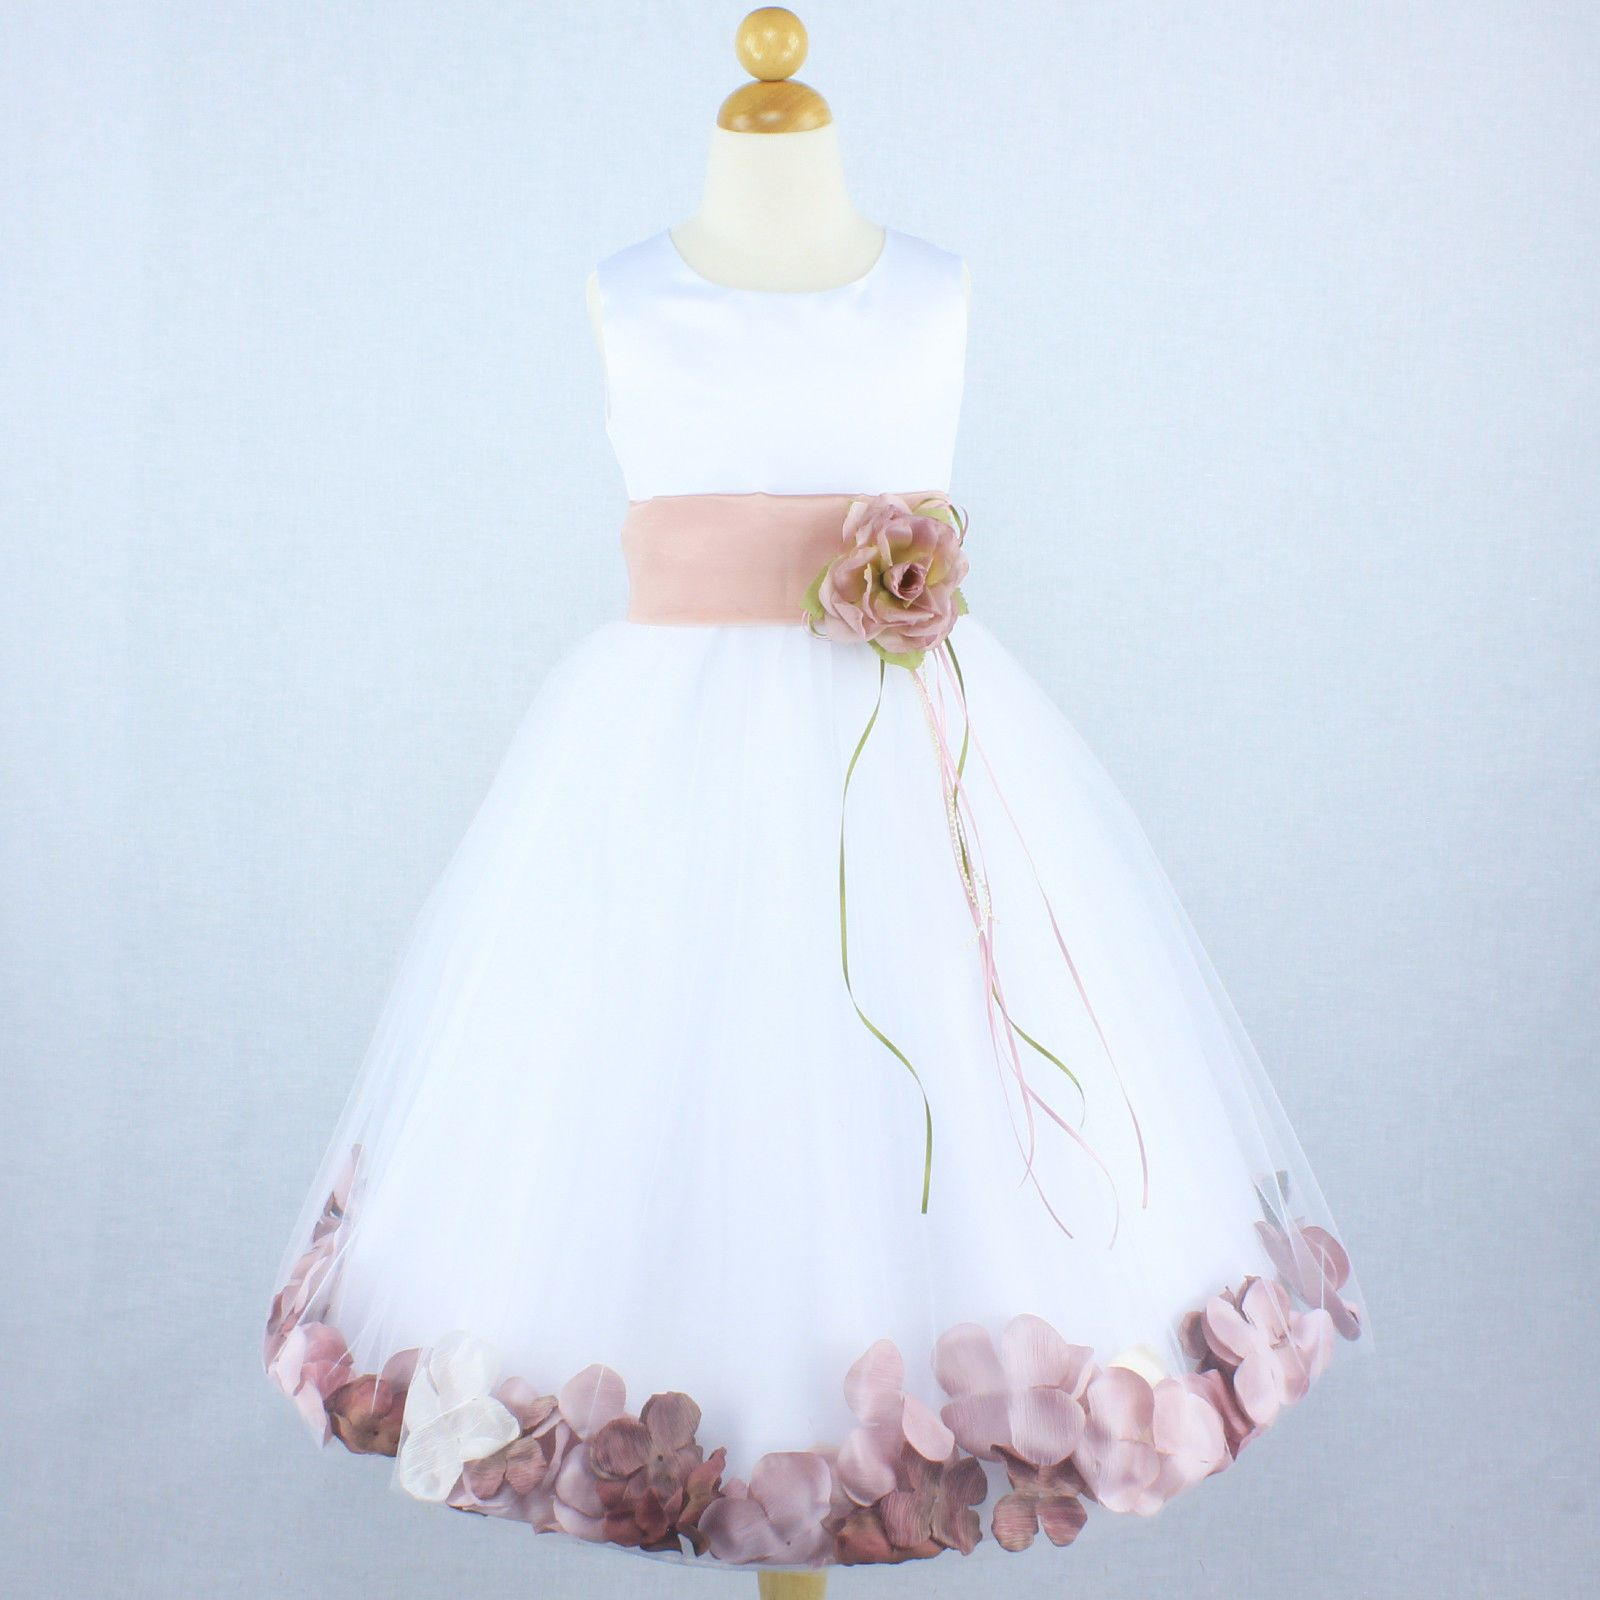 Details About Ivory Dusty Rose Flower Girl Dress Petals Formal